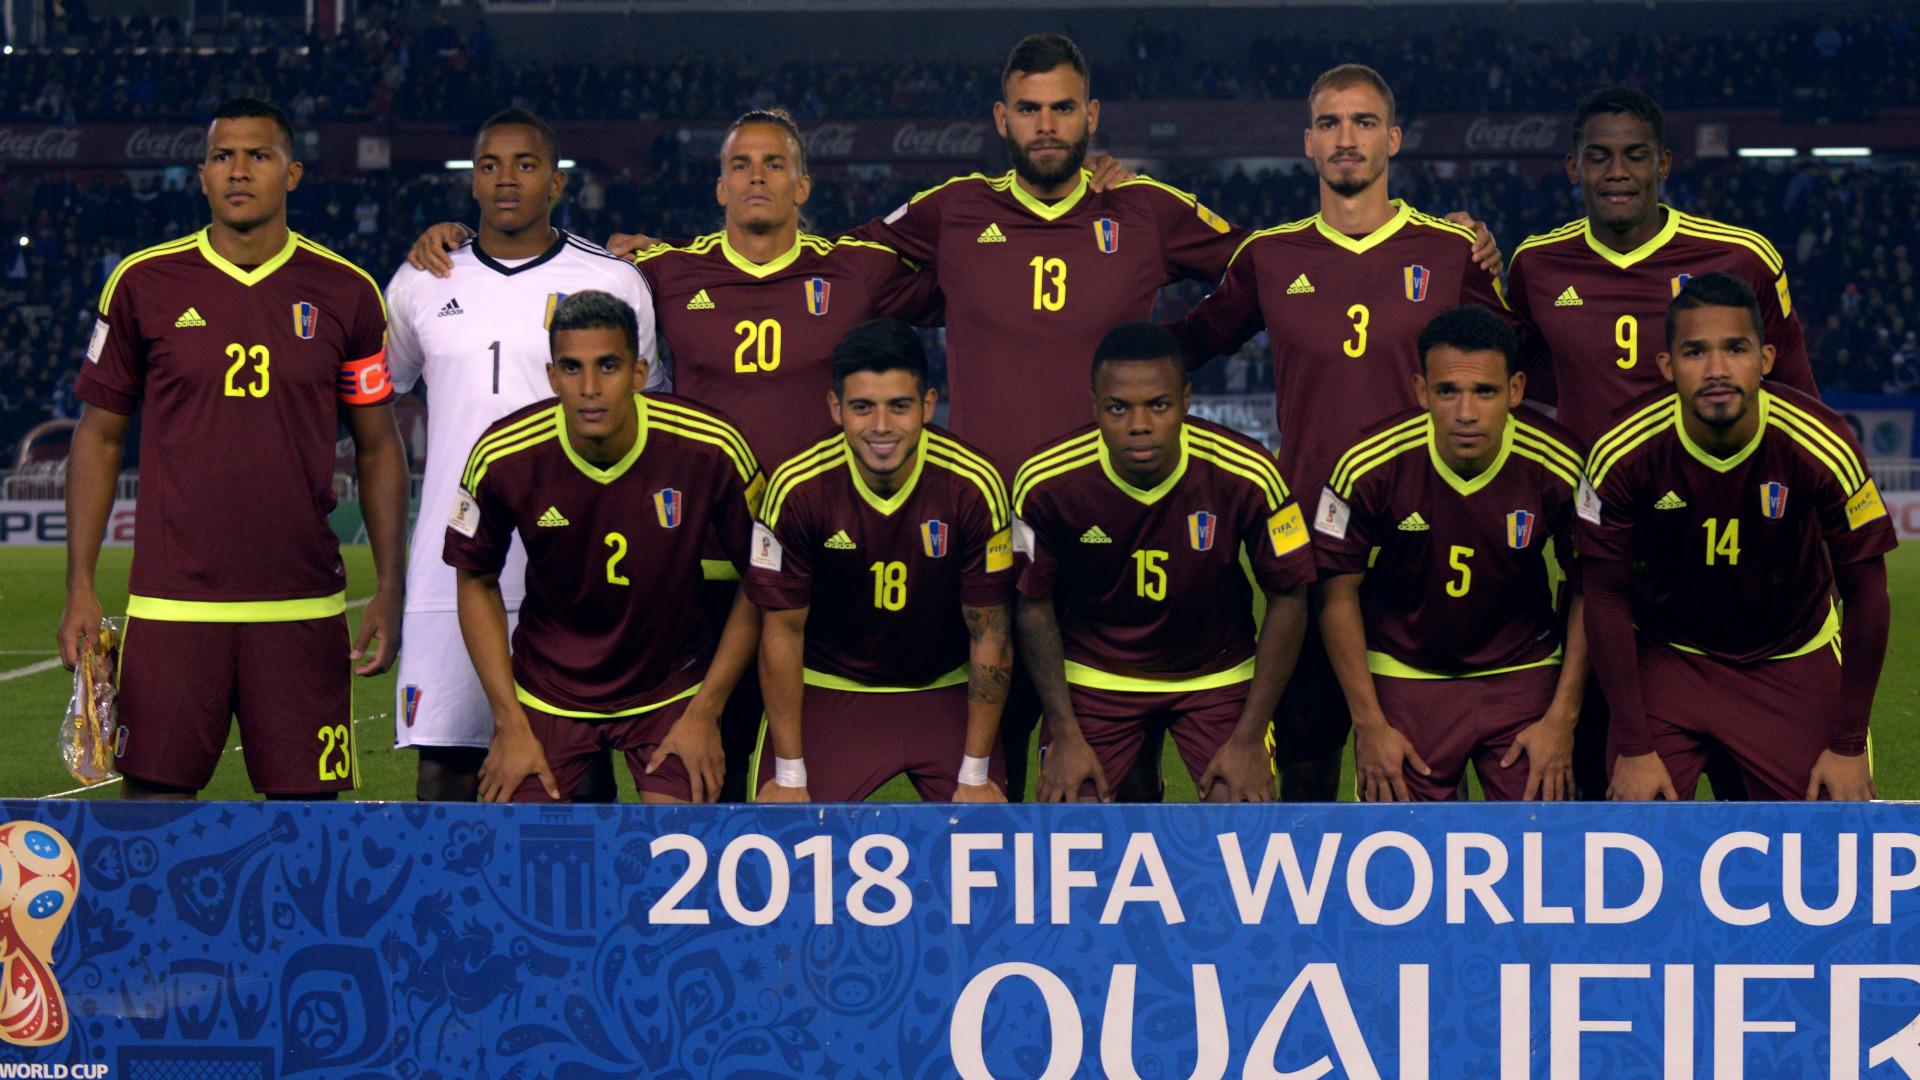 xi venezuela vs argentina eliminatorias 05092017